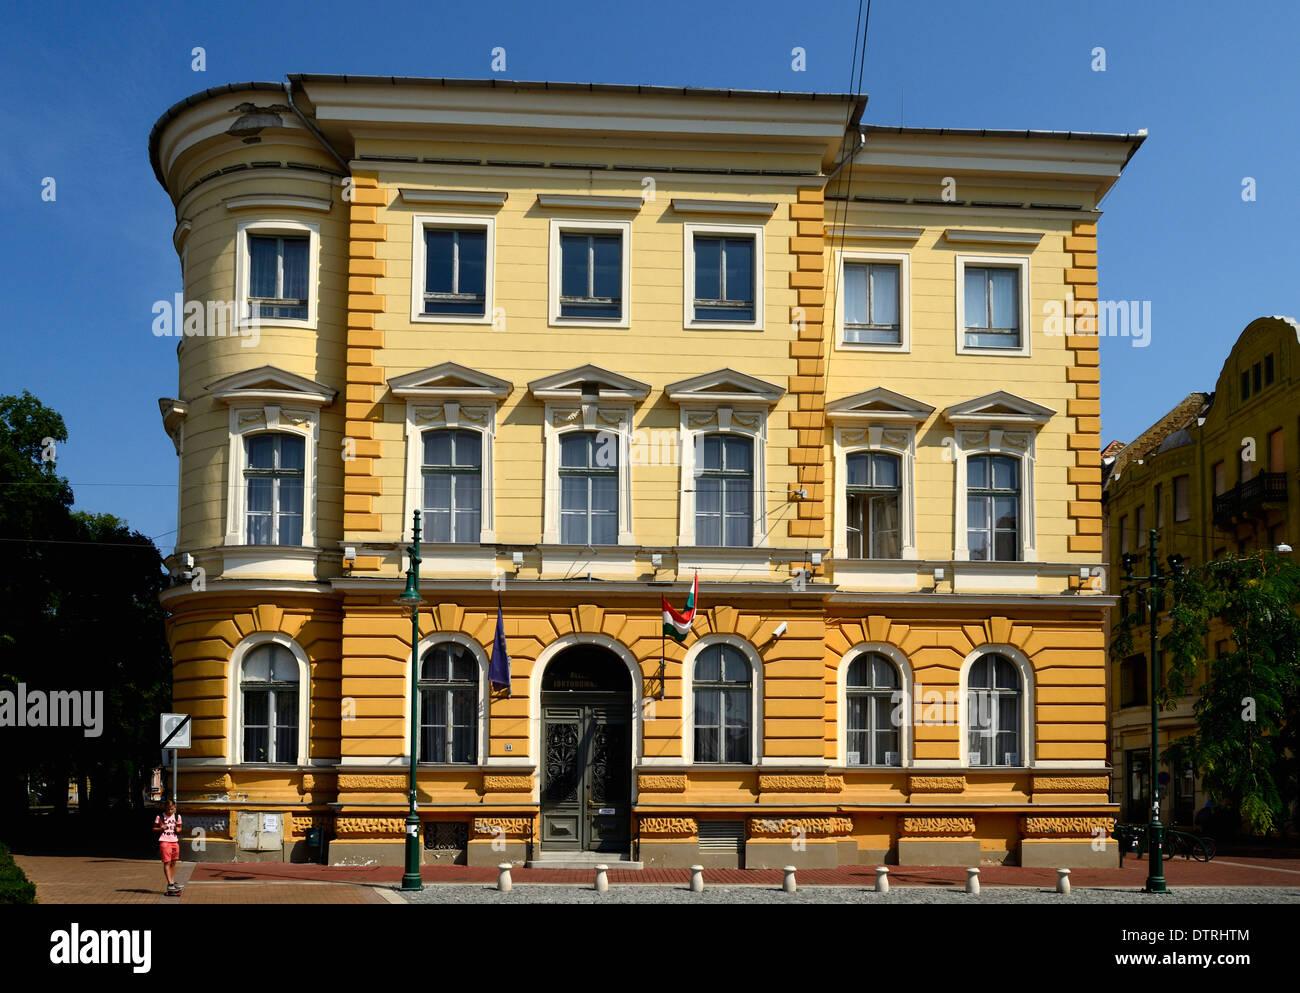 Jurisprudential State University building Szeged Hungary - Stock Image